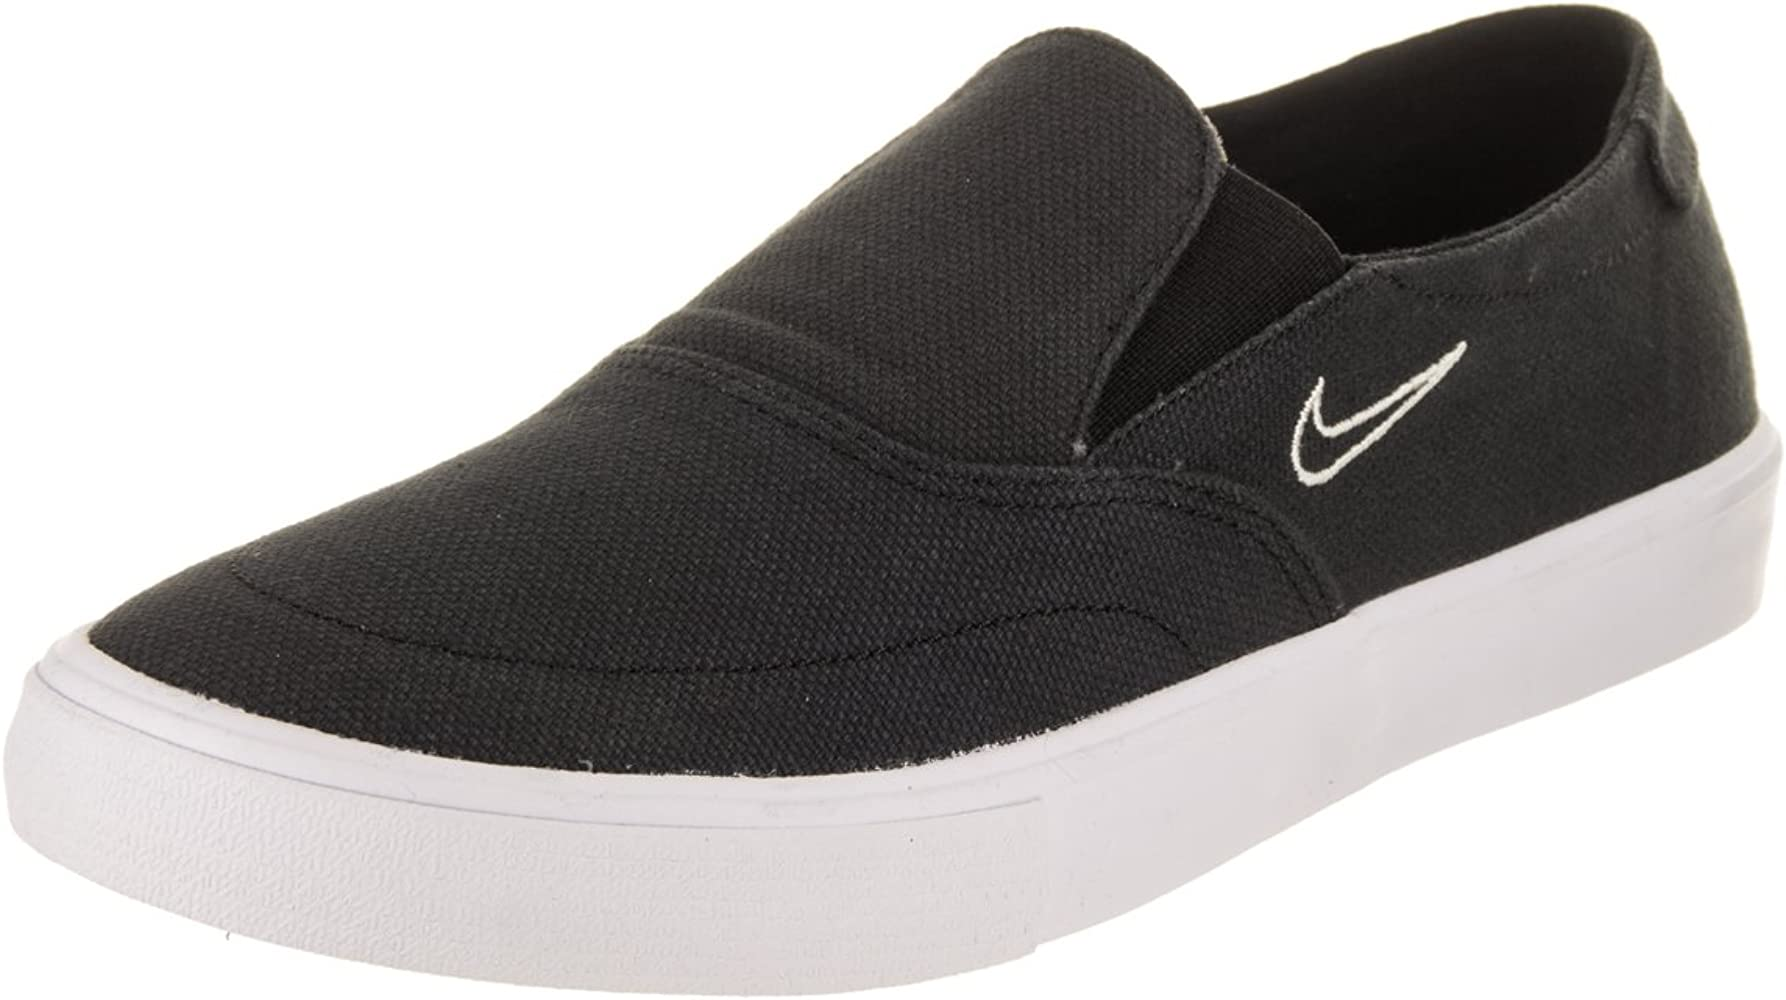 Chaussures Homme Nike SB Portmore II Solarsoft Slip on